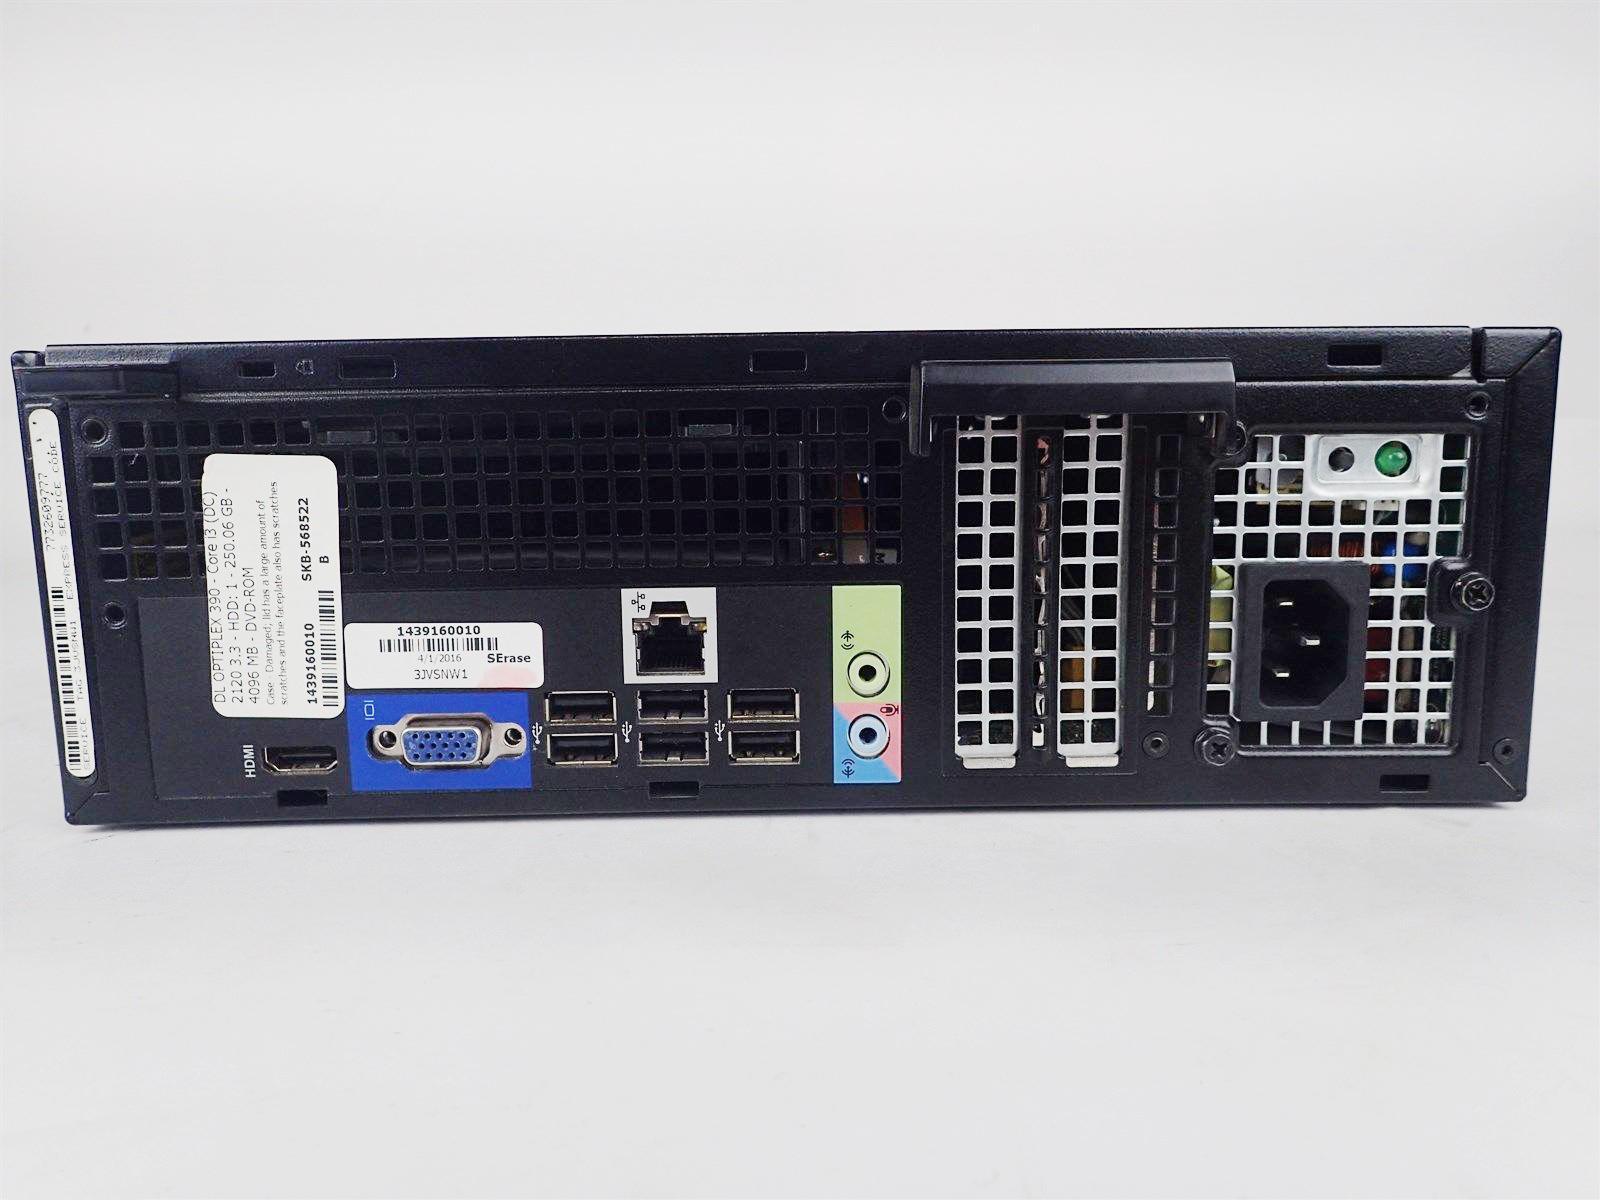 dell-optiplex-390-sff-dual-core-i3-2120-3-3ghz-4gb-ram-250gb-hdd-dvd-hdmi-25d8c207b1c050169c17ba563814166c.jpg